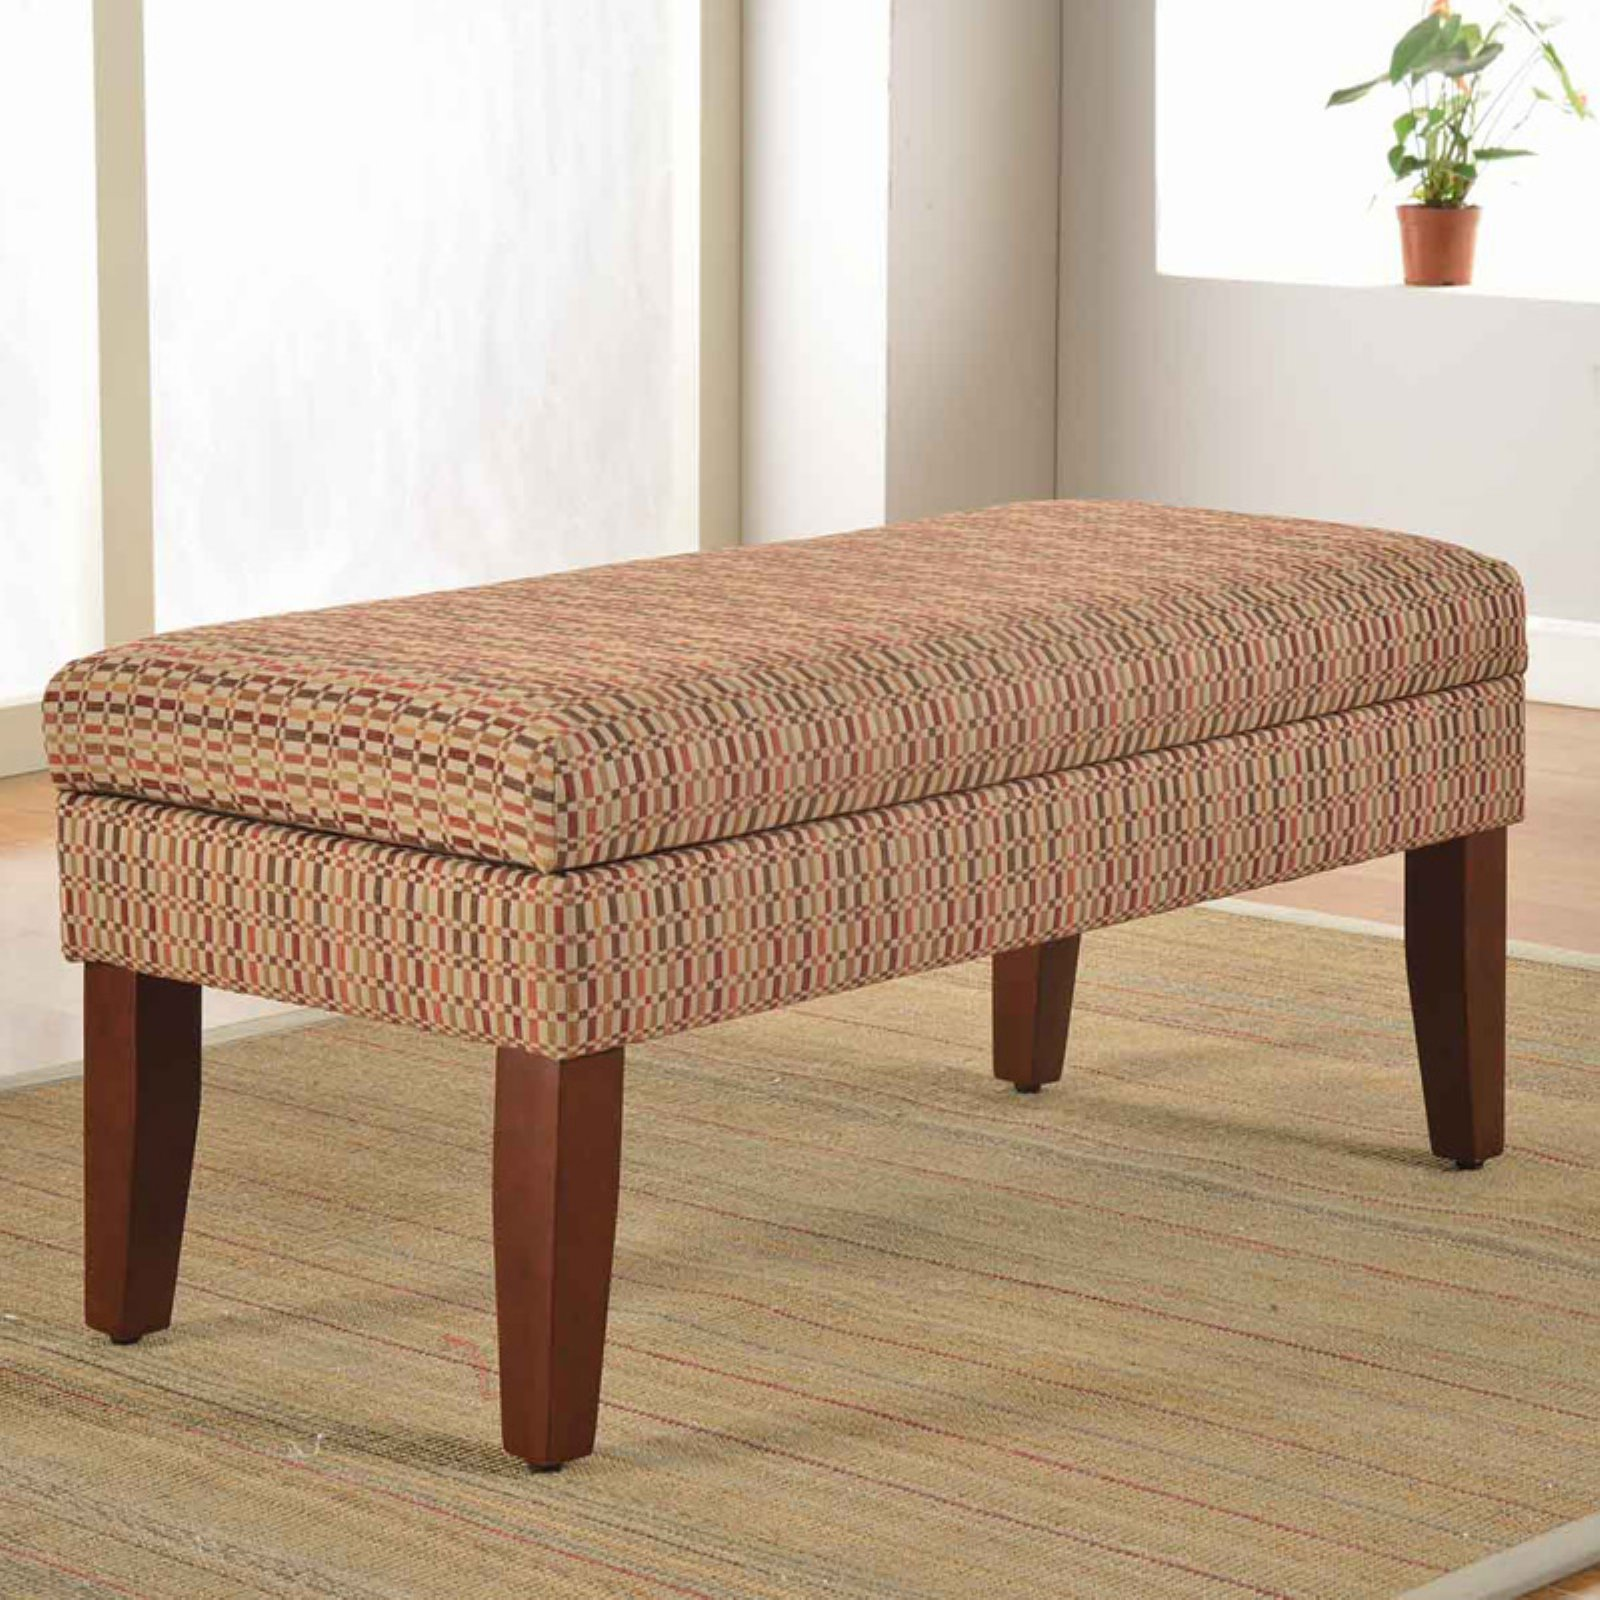 Kinfine USA Decorative Geometric Storage Bench